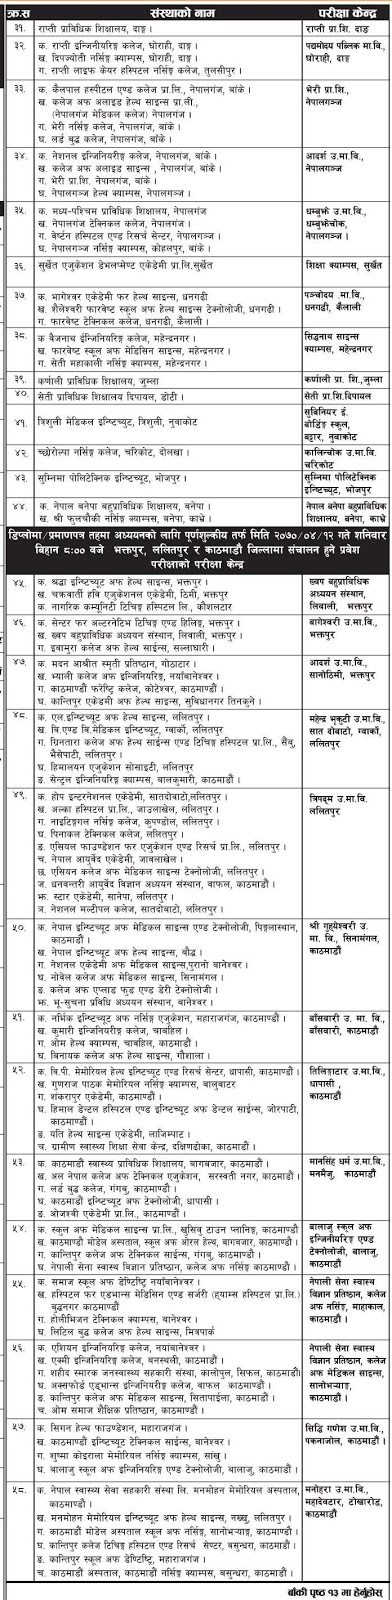 Published exam center notice for diploma entrance examination-2070